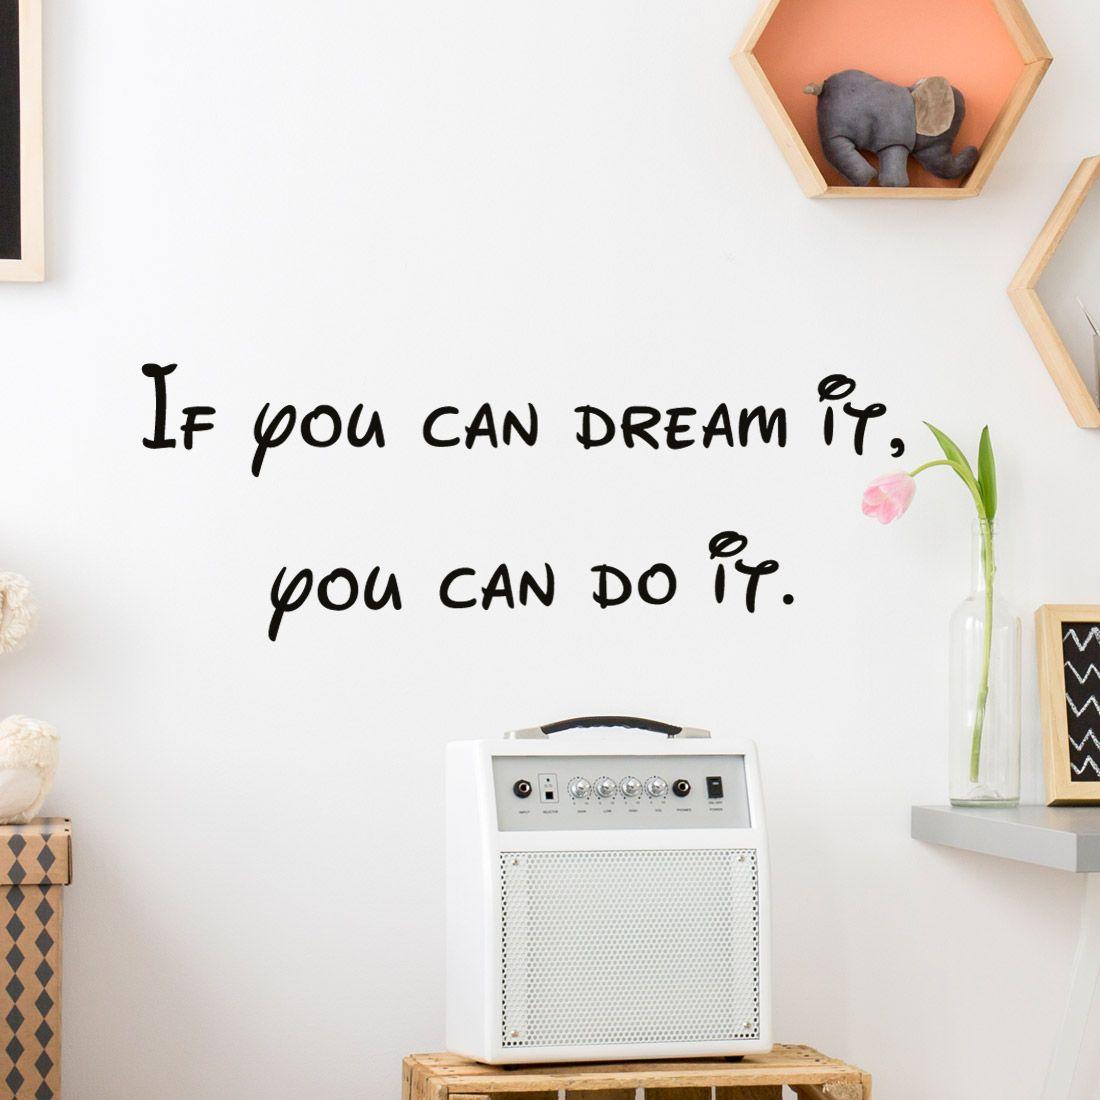 Muursticker Zelf Ontwerpen.Muursticker If You Can Dream It You Can Do It In 2019